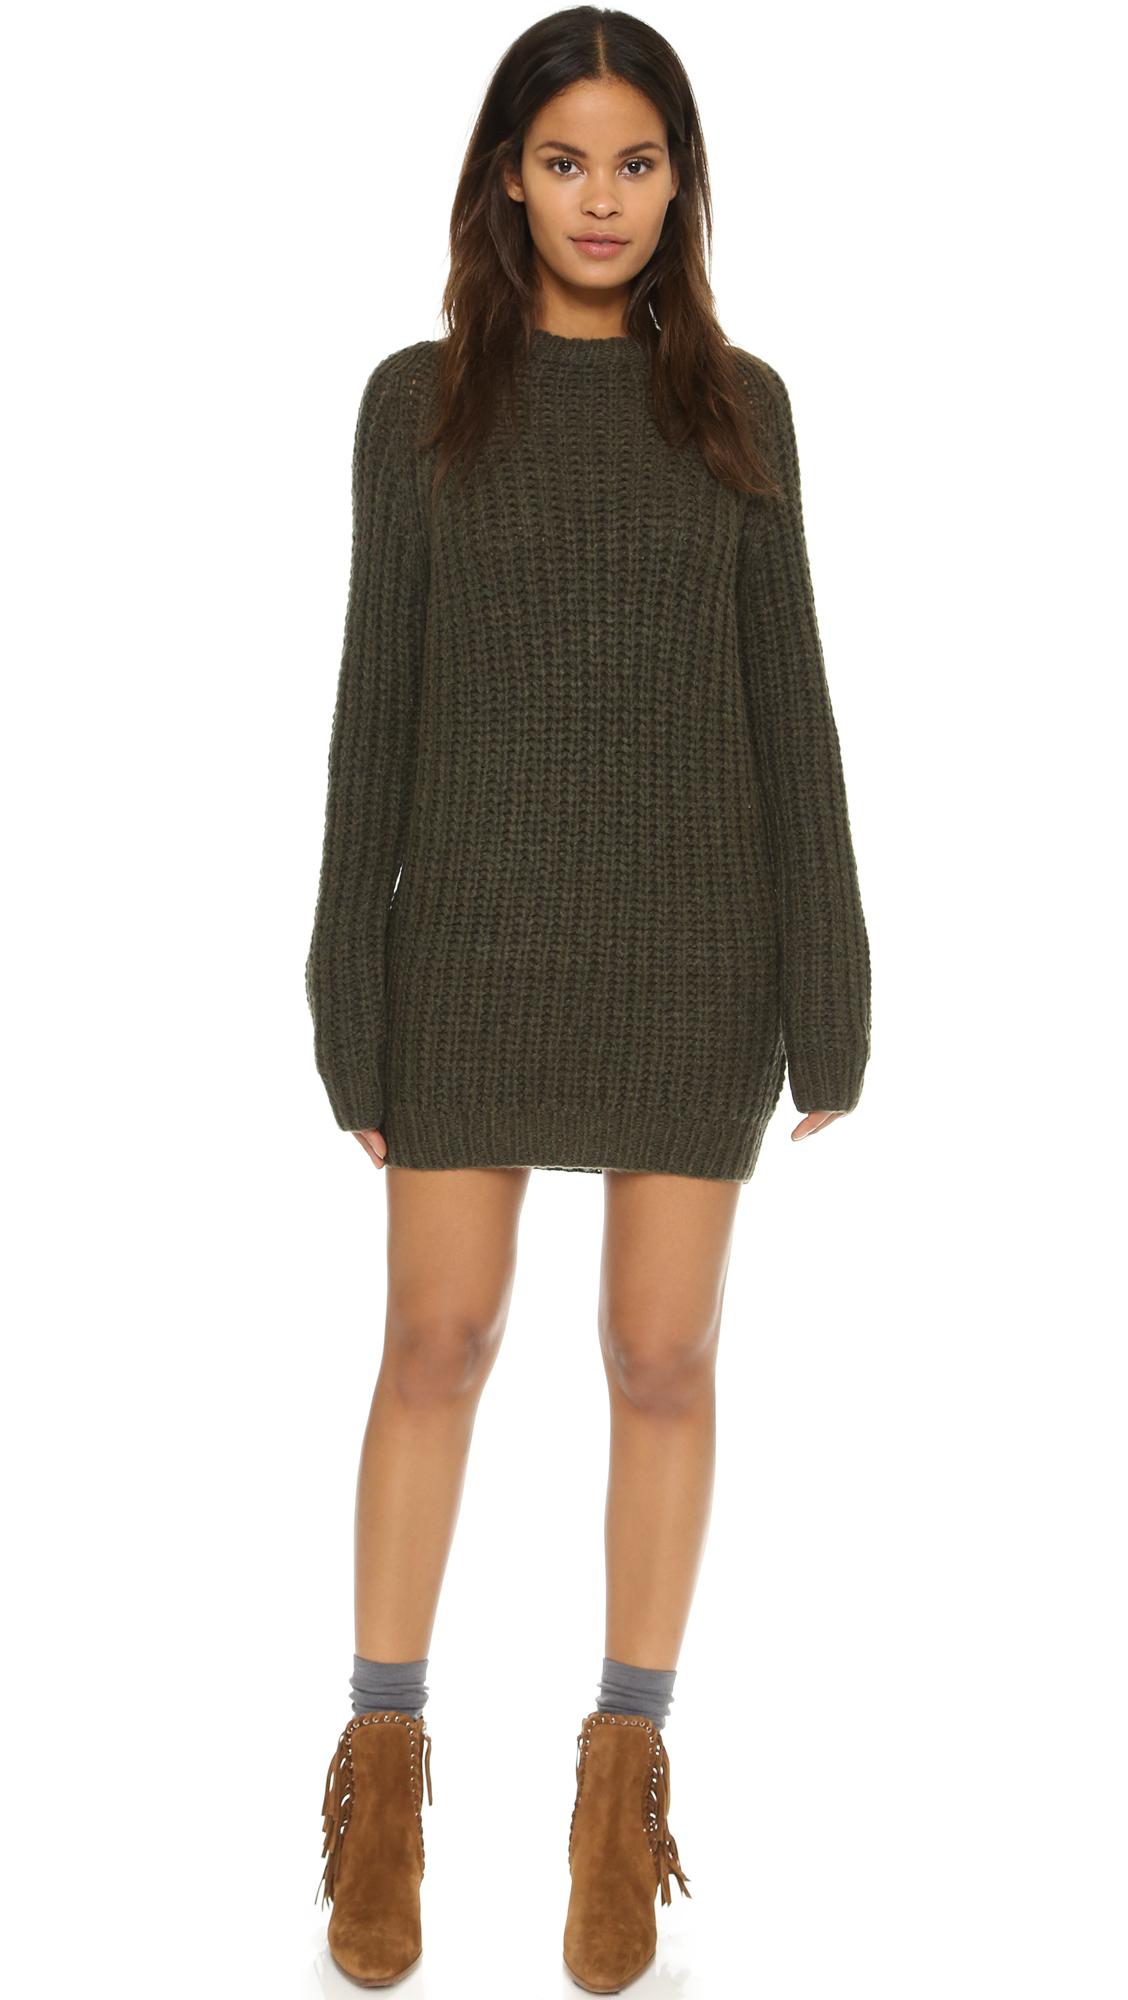 5e11385581a NLST Fisherman Sweater Dress - Olive Drab in Green - Lyst